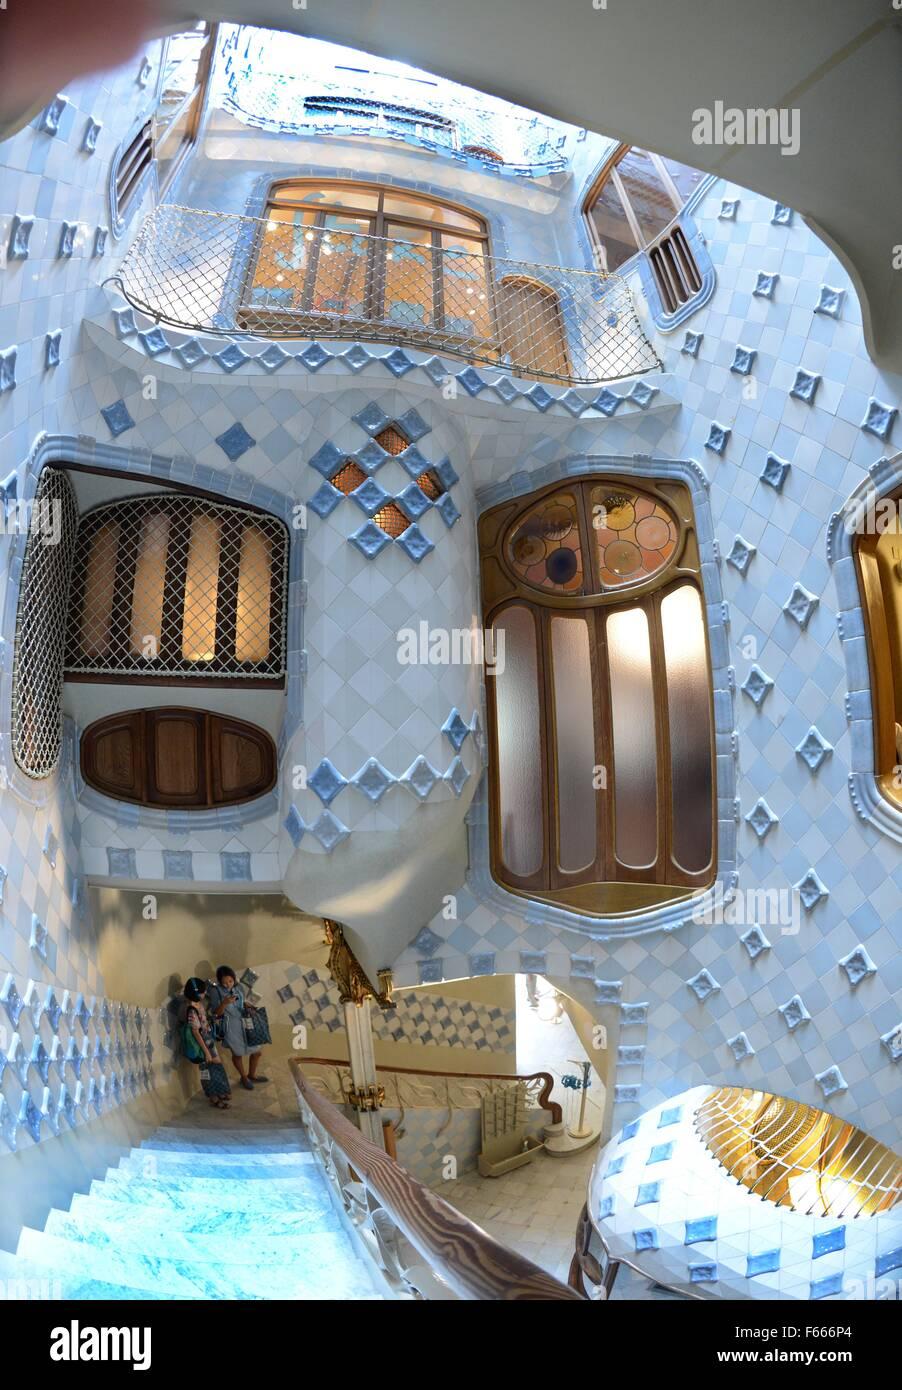 Barcelona, Spain. 24th July, 2015. Famous Spanish architect Antoni Gaudi (1852-1926) rebuilt the facade and interior - Stock Image